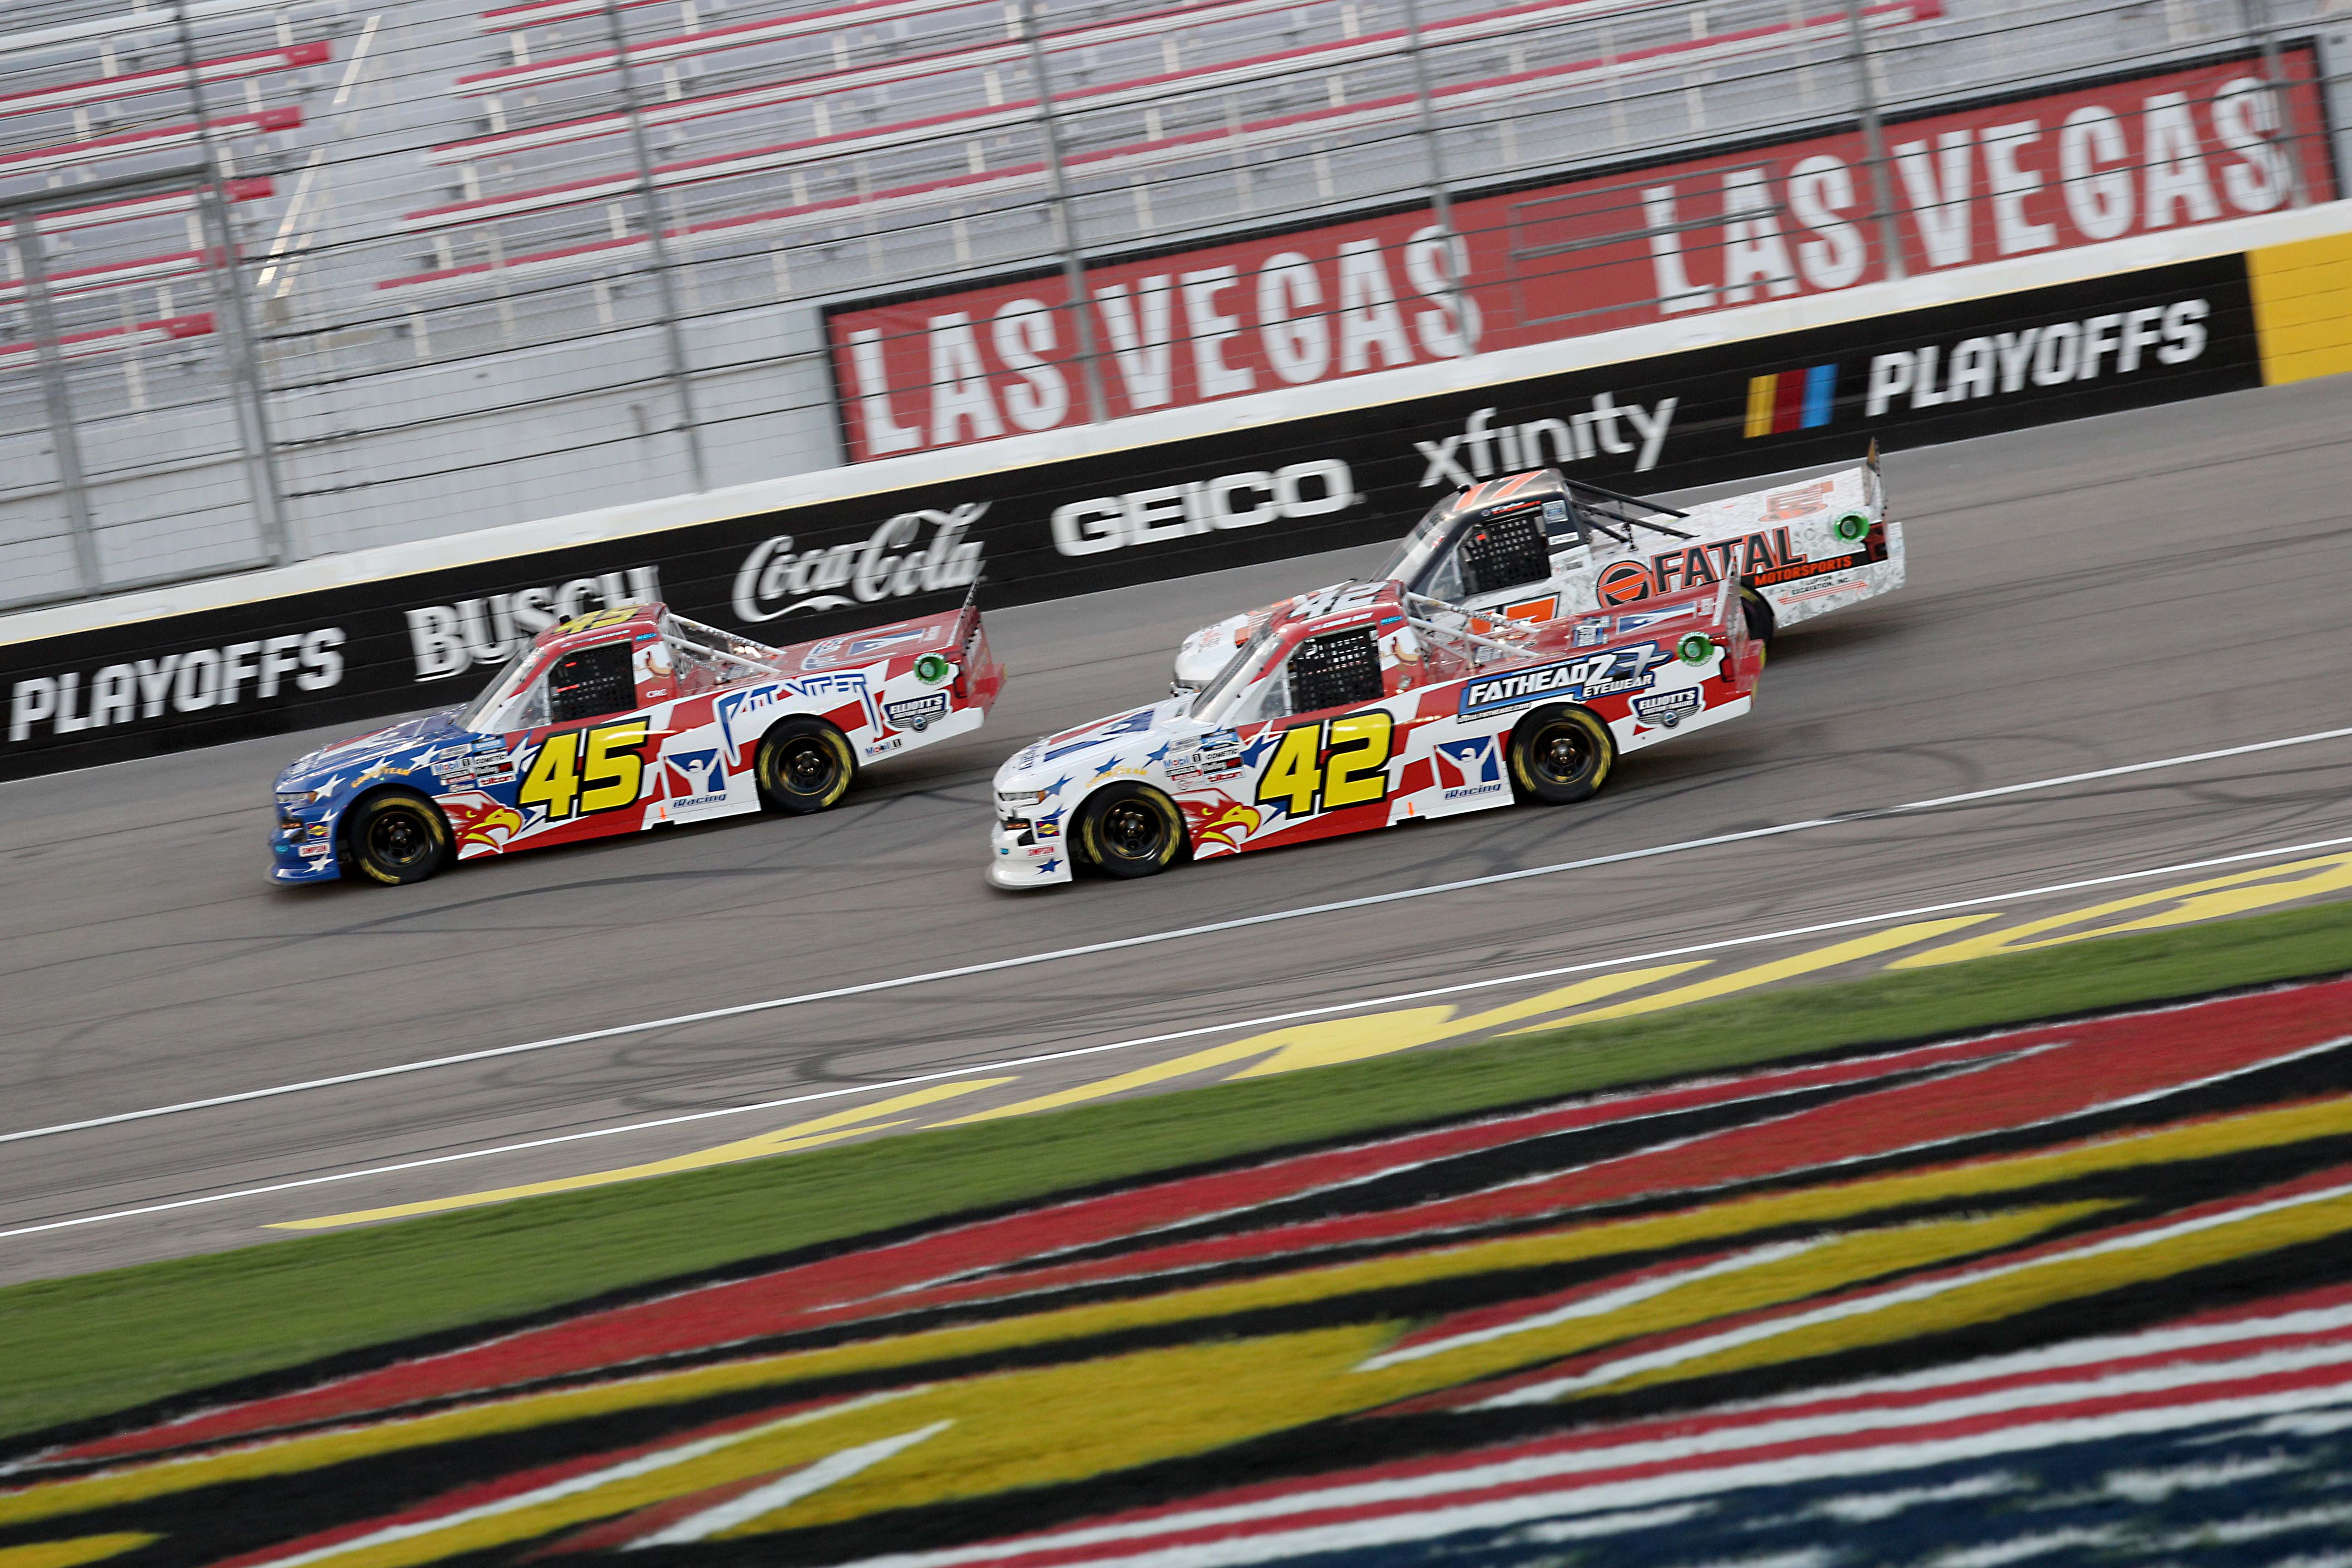 Las Vegas Race Results: September 25, 2020 (NASCAR Truck Series) - Racing News